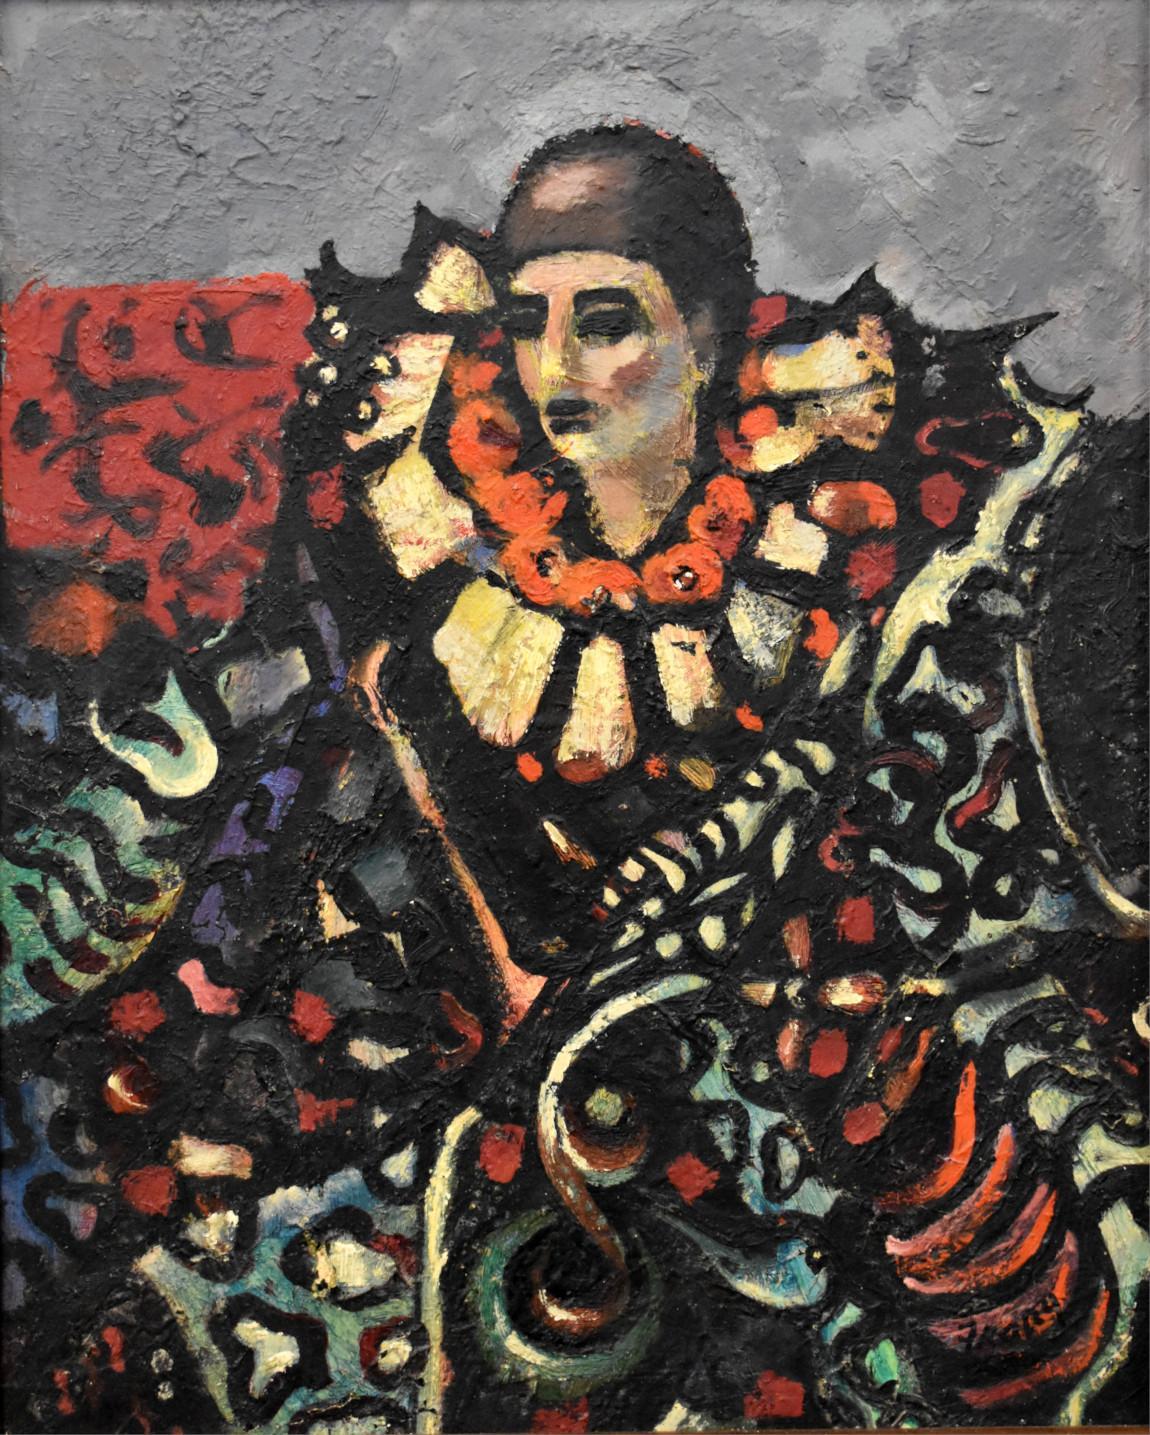 """THE CLOWN"" MICHAEL FRARY MID CENTURY MODERN TEXAS ARTIST"